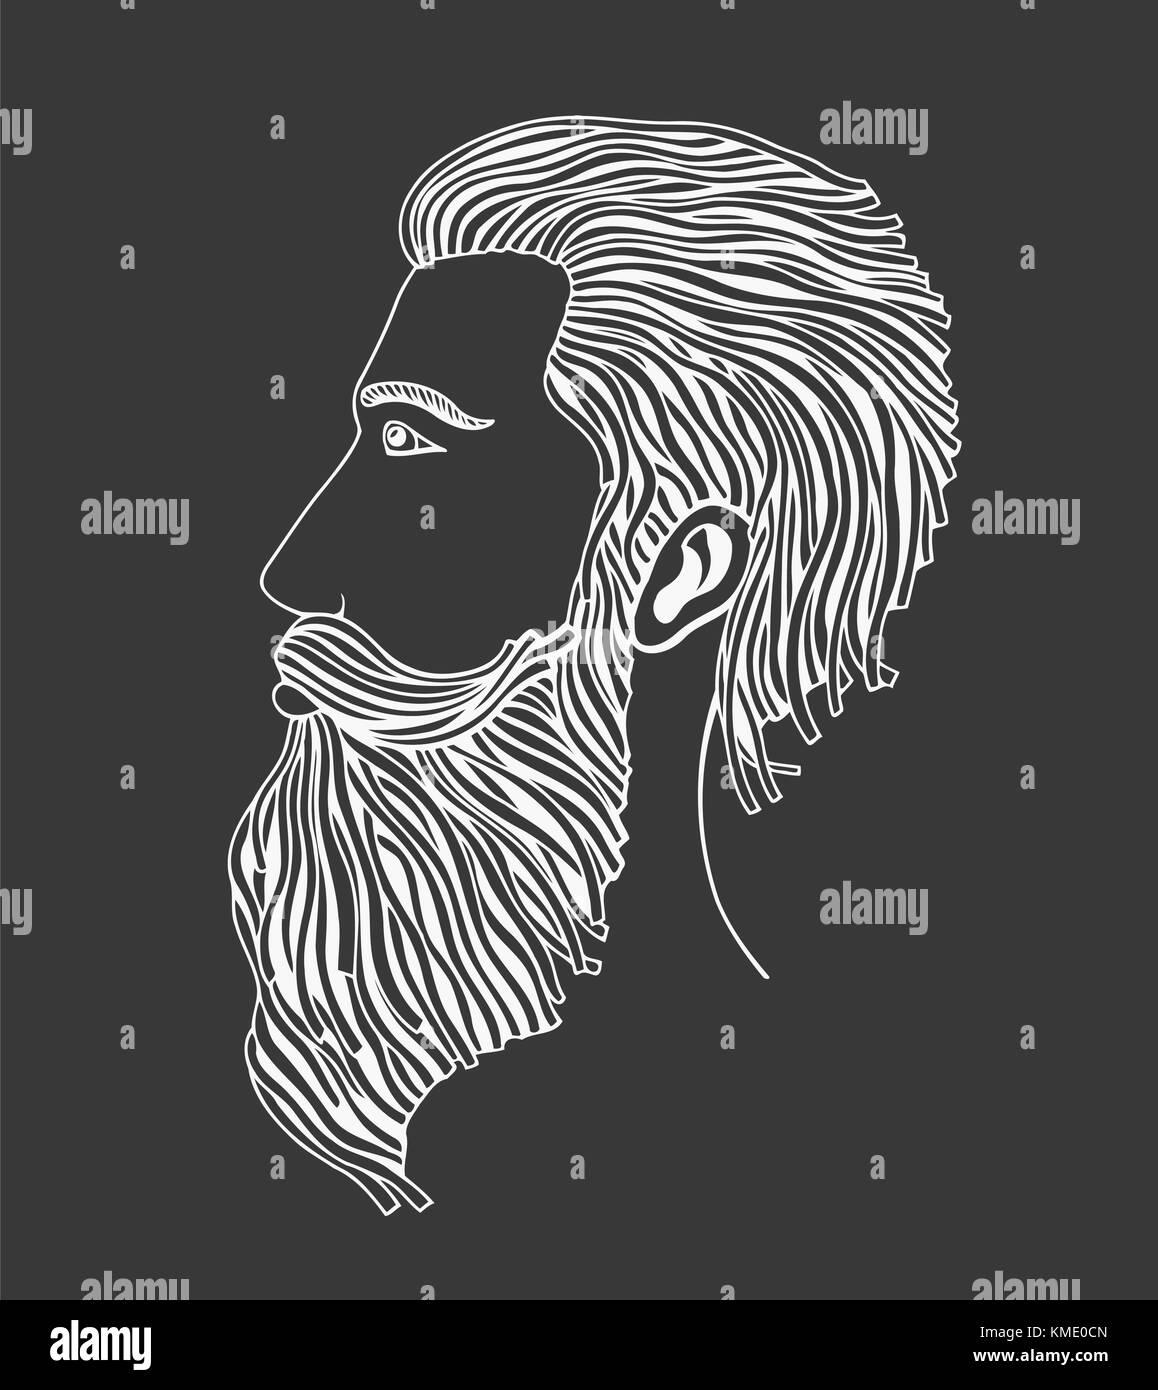 male beard drawn stock photos amp male beard drawn stock